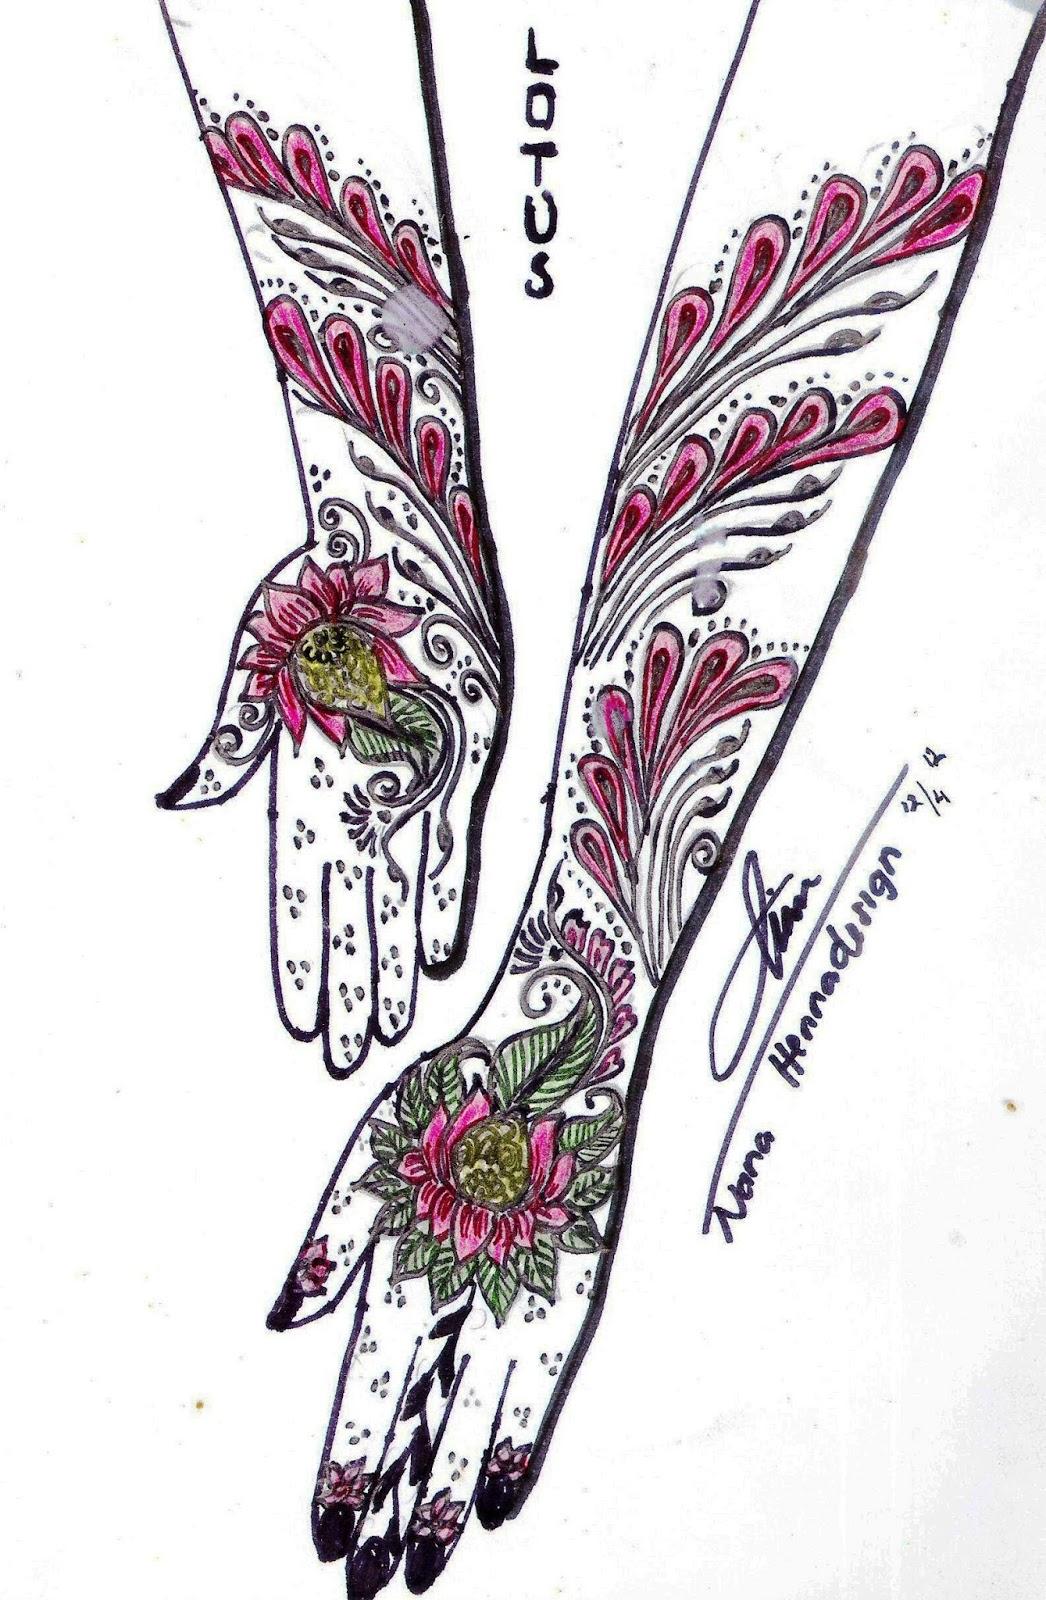 NANA HENNA UNGARAN SEMARANG HENNA DESIGN ON PAPER By NANA HENNA